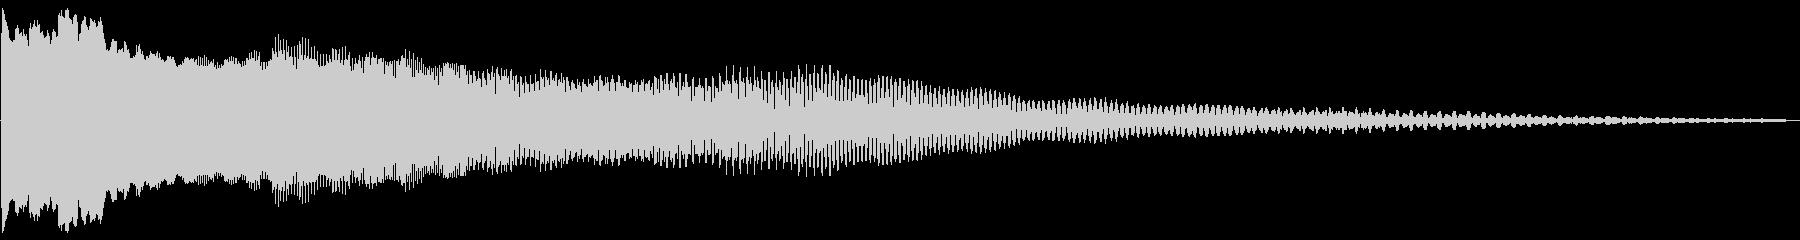 OLDPOWERバージョン1の未再生の波形